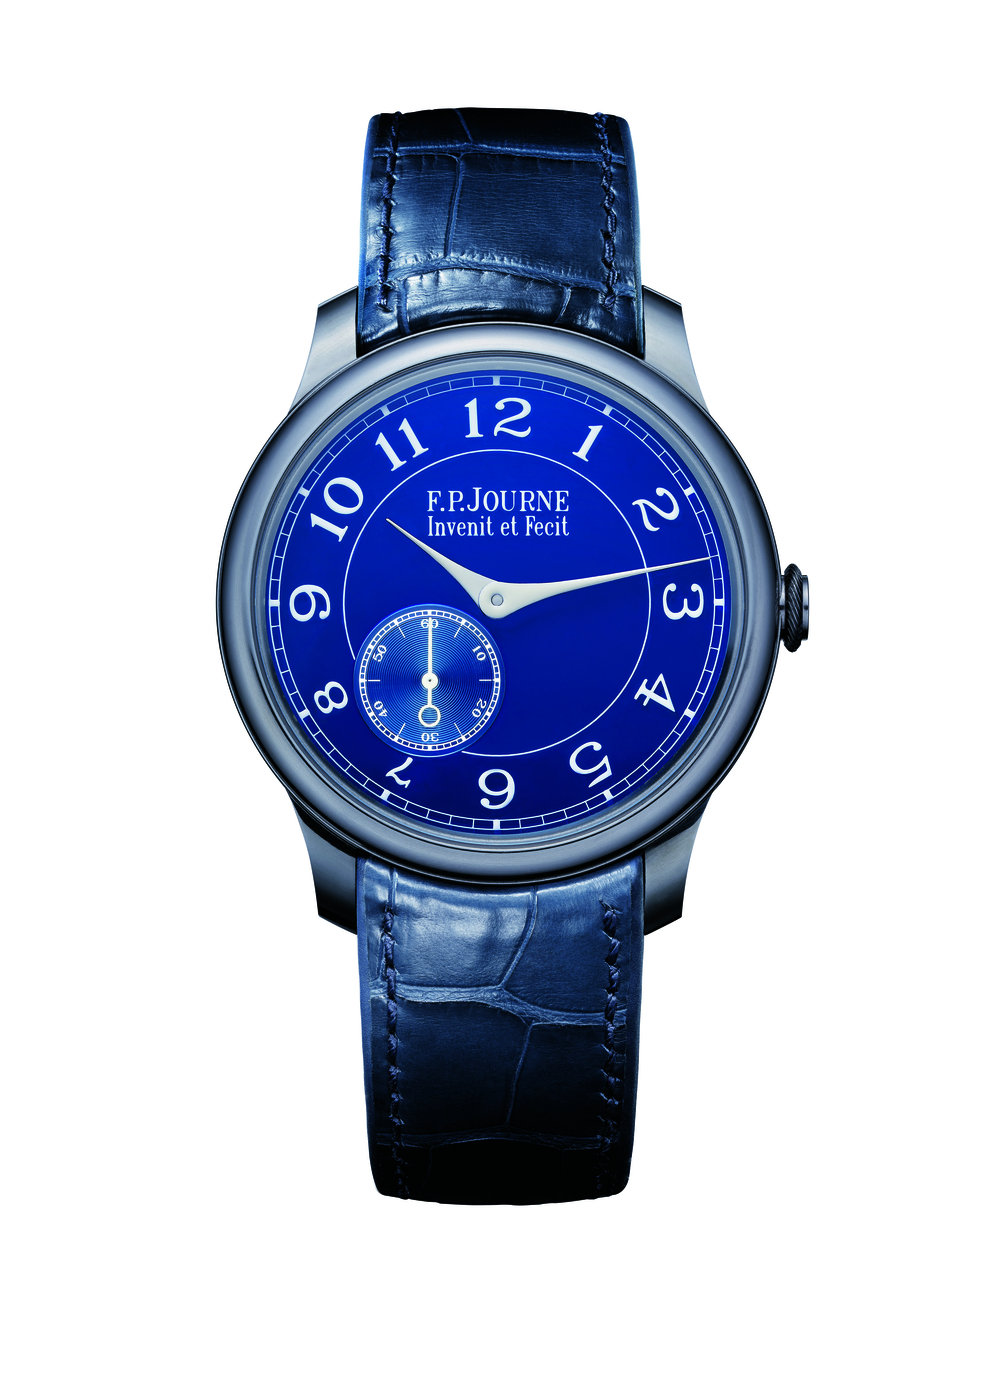 Chronometre Bleu, tantalum, crocodile strap, tantalum buckle.jpg